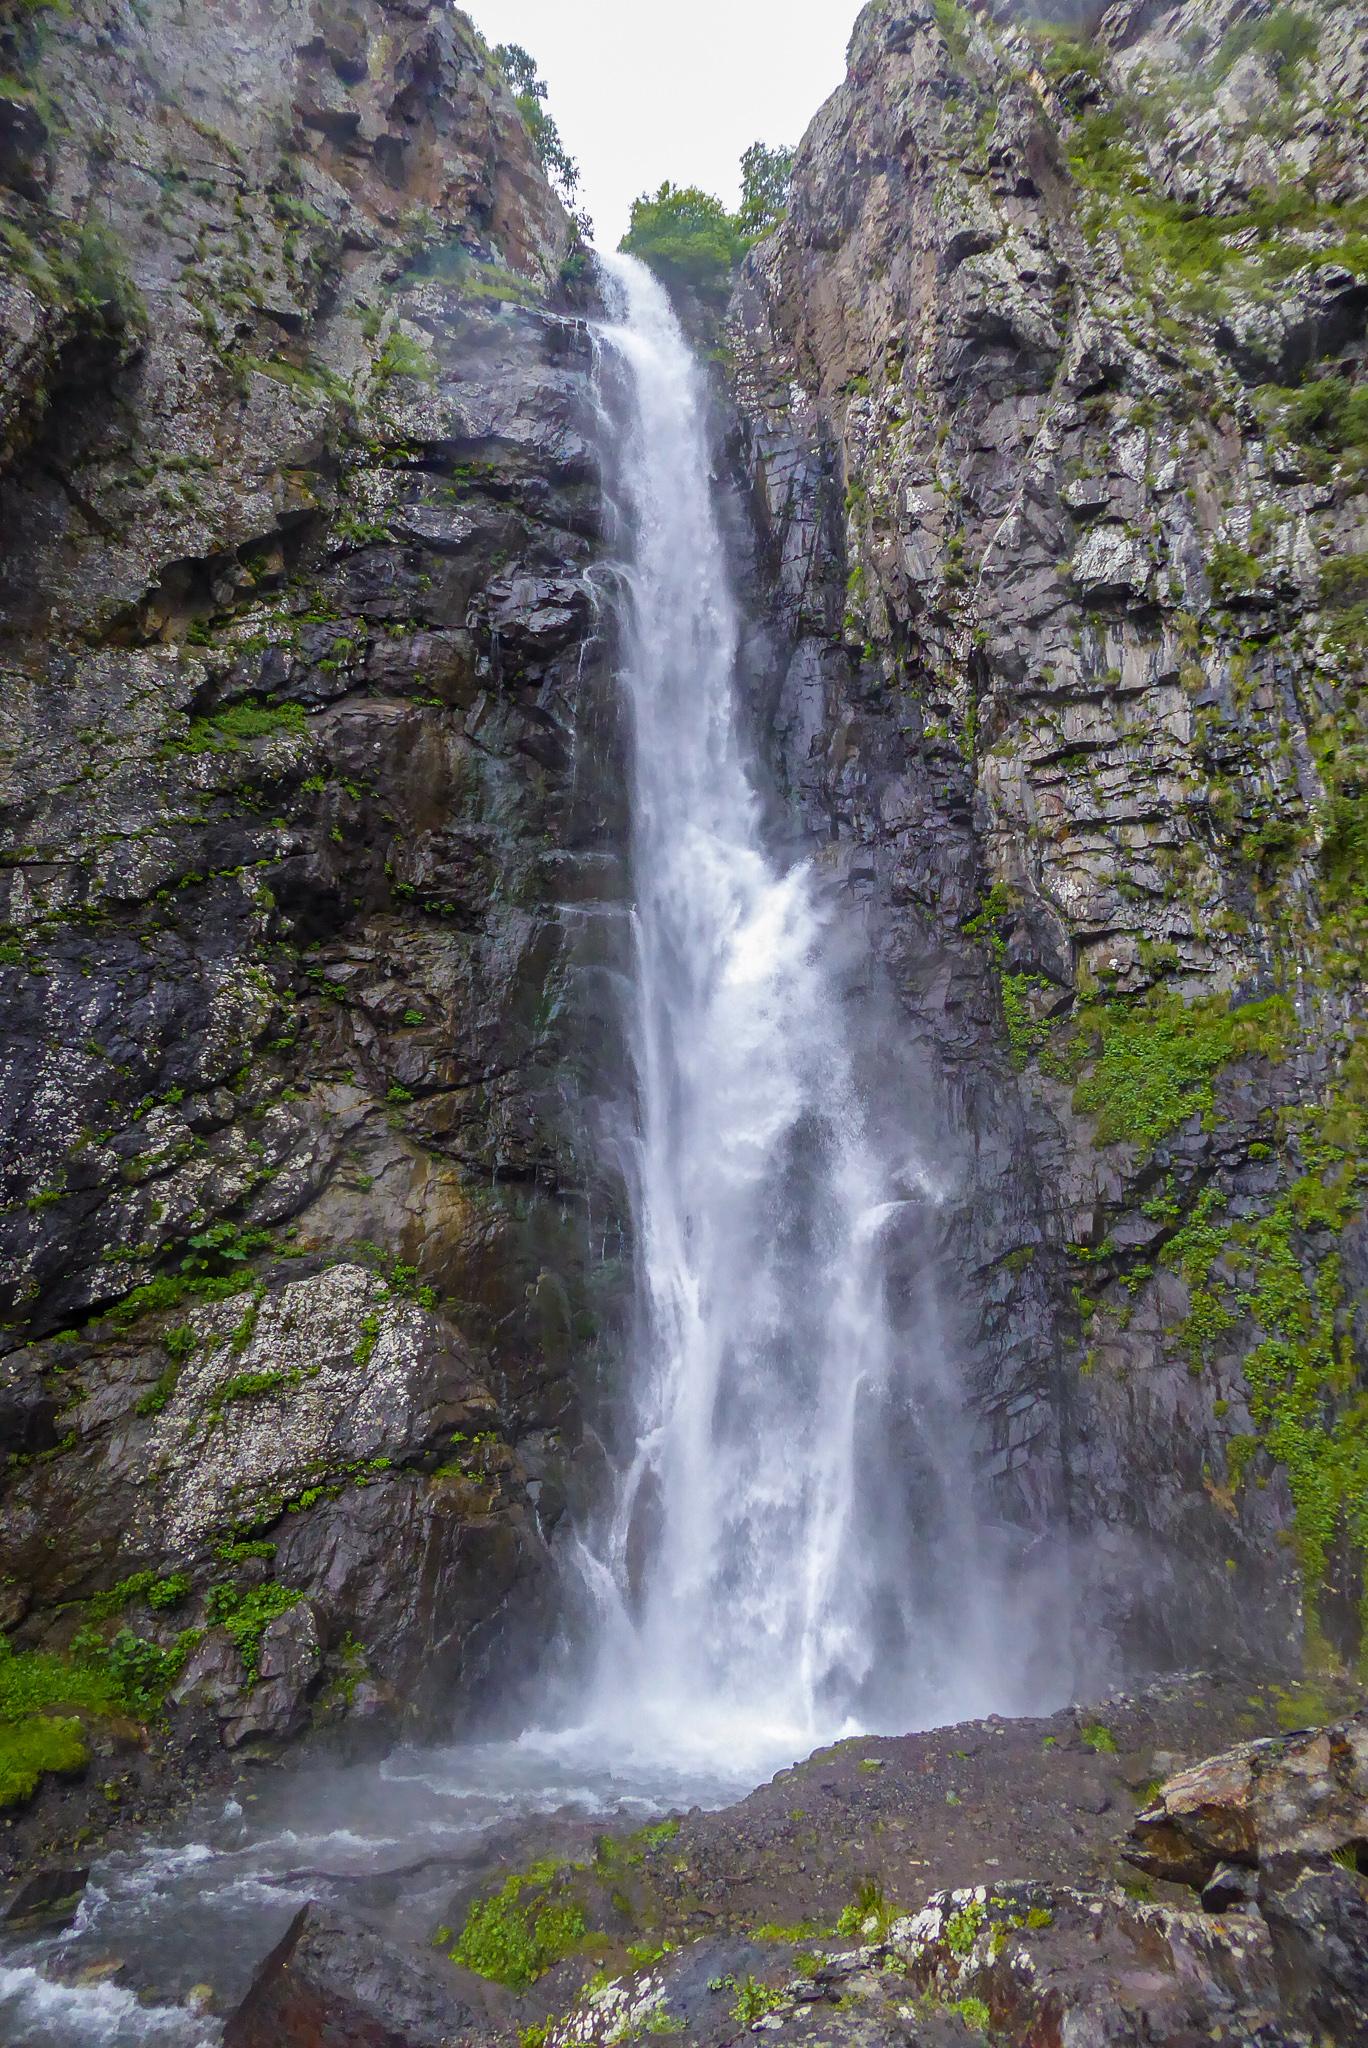 The more impressive Big Waterfall